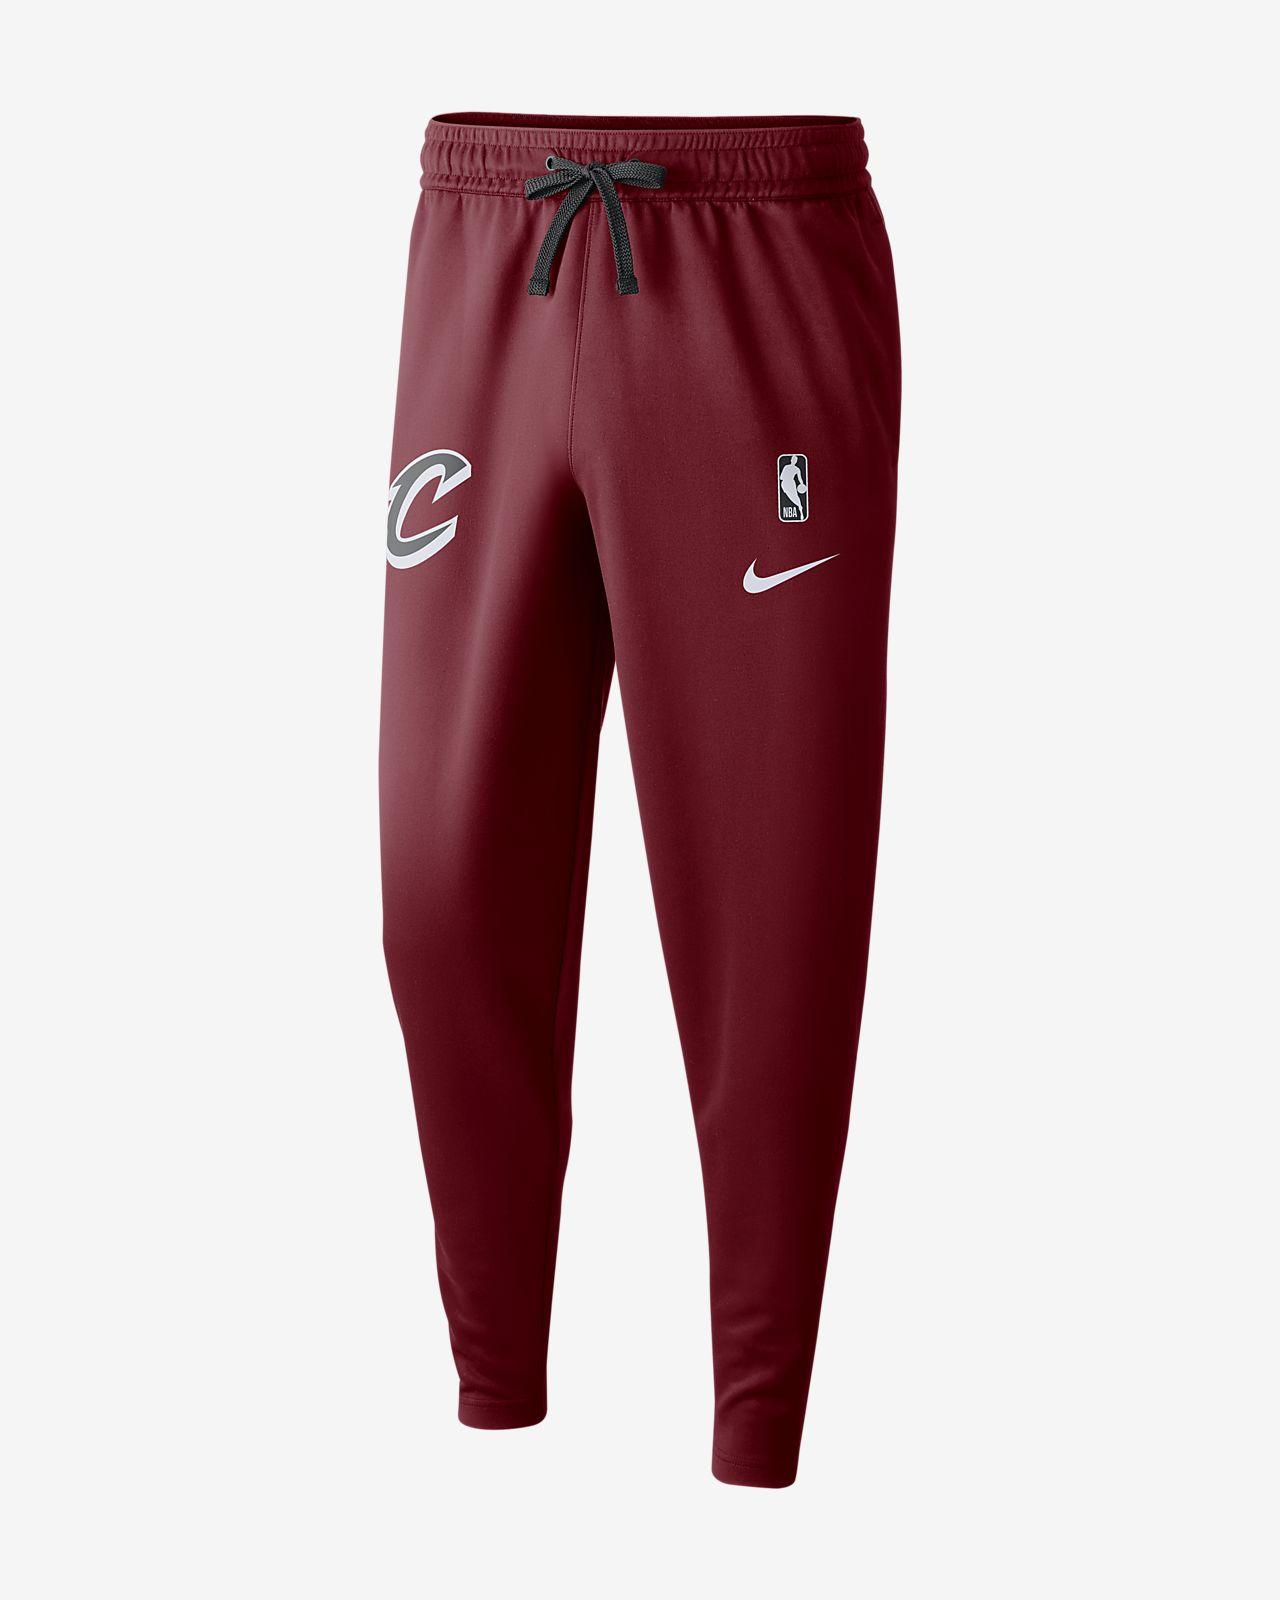 Cleveland Cavaliers Nike Spotlight NBA-Hose für Herren